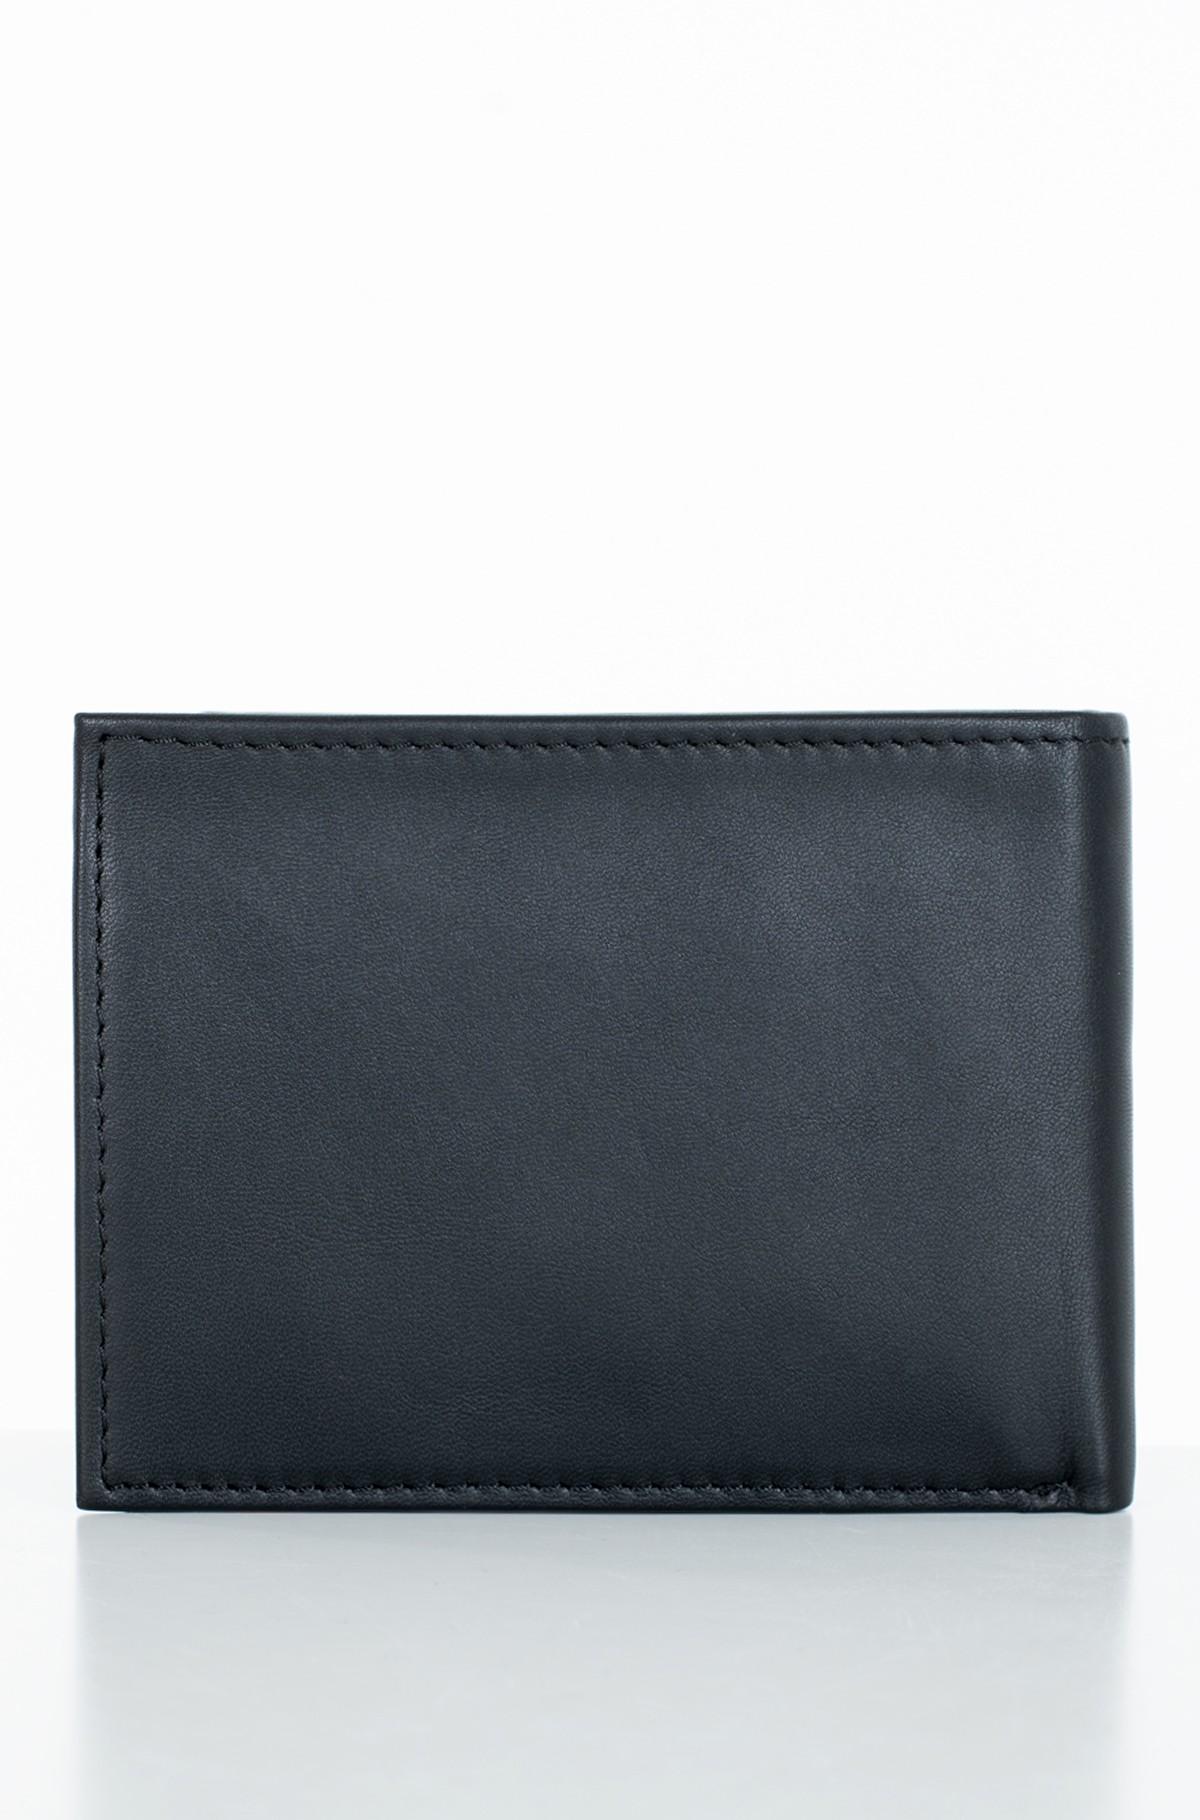 Wallet SMDAEL LEA20-full-3